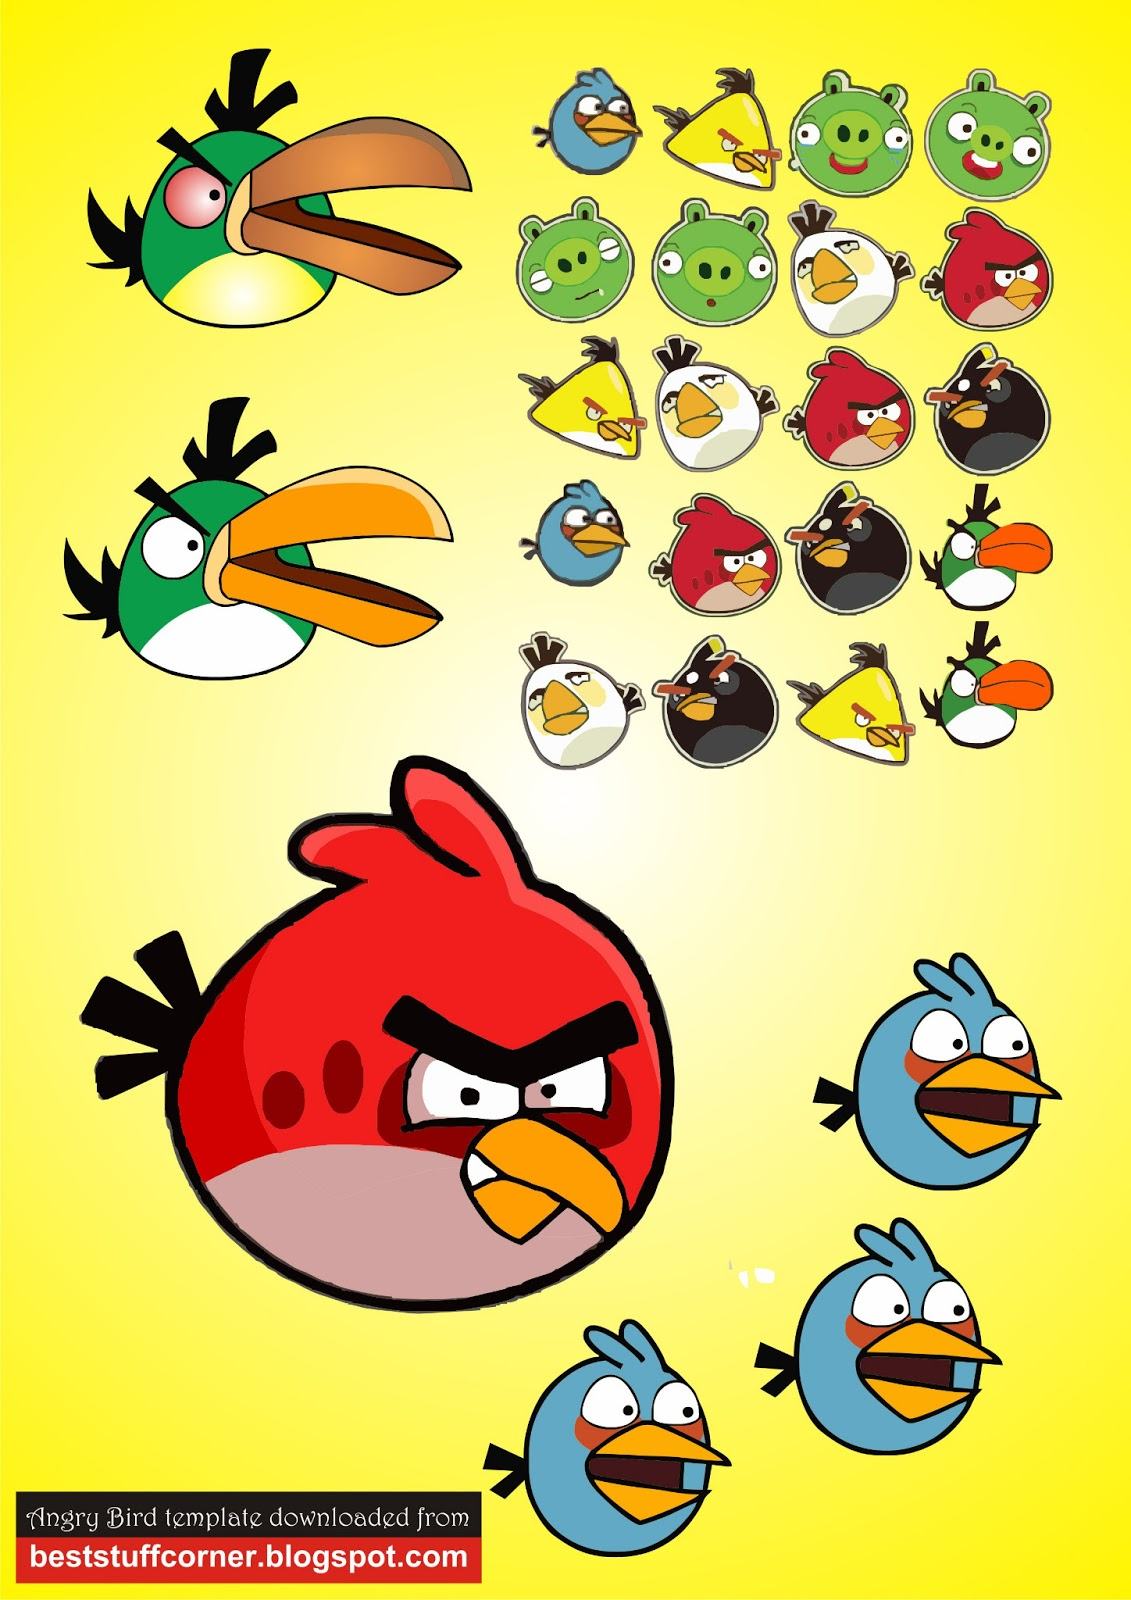 1131x1600 Best Stuff Corner Free Angry Bird Vector Image Template